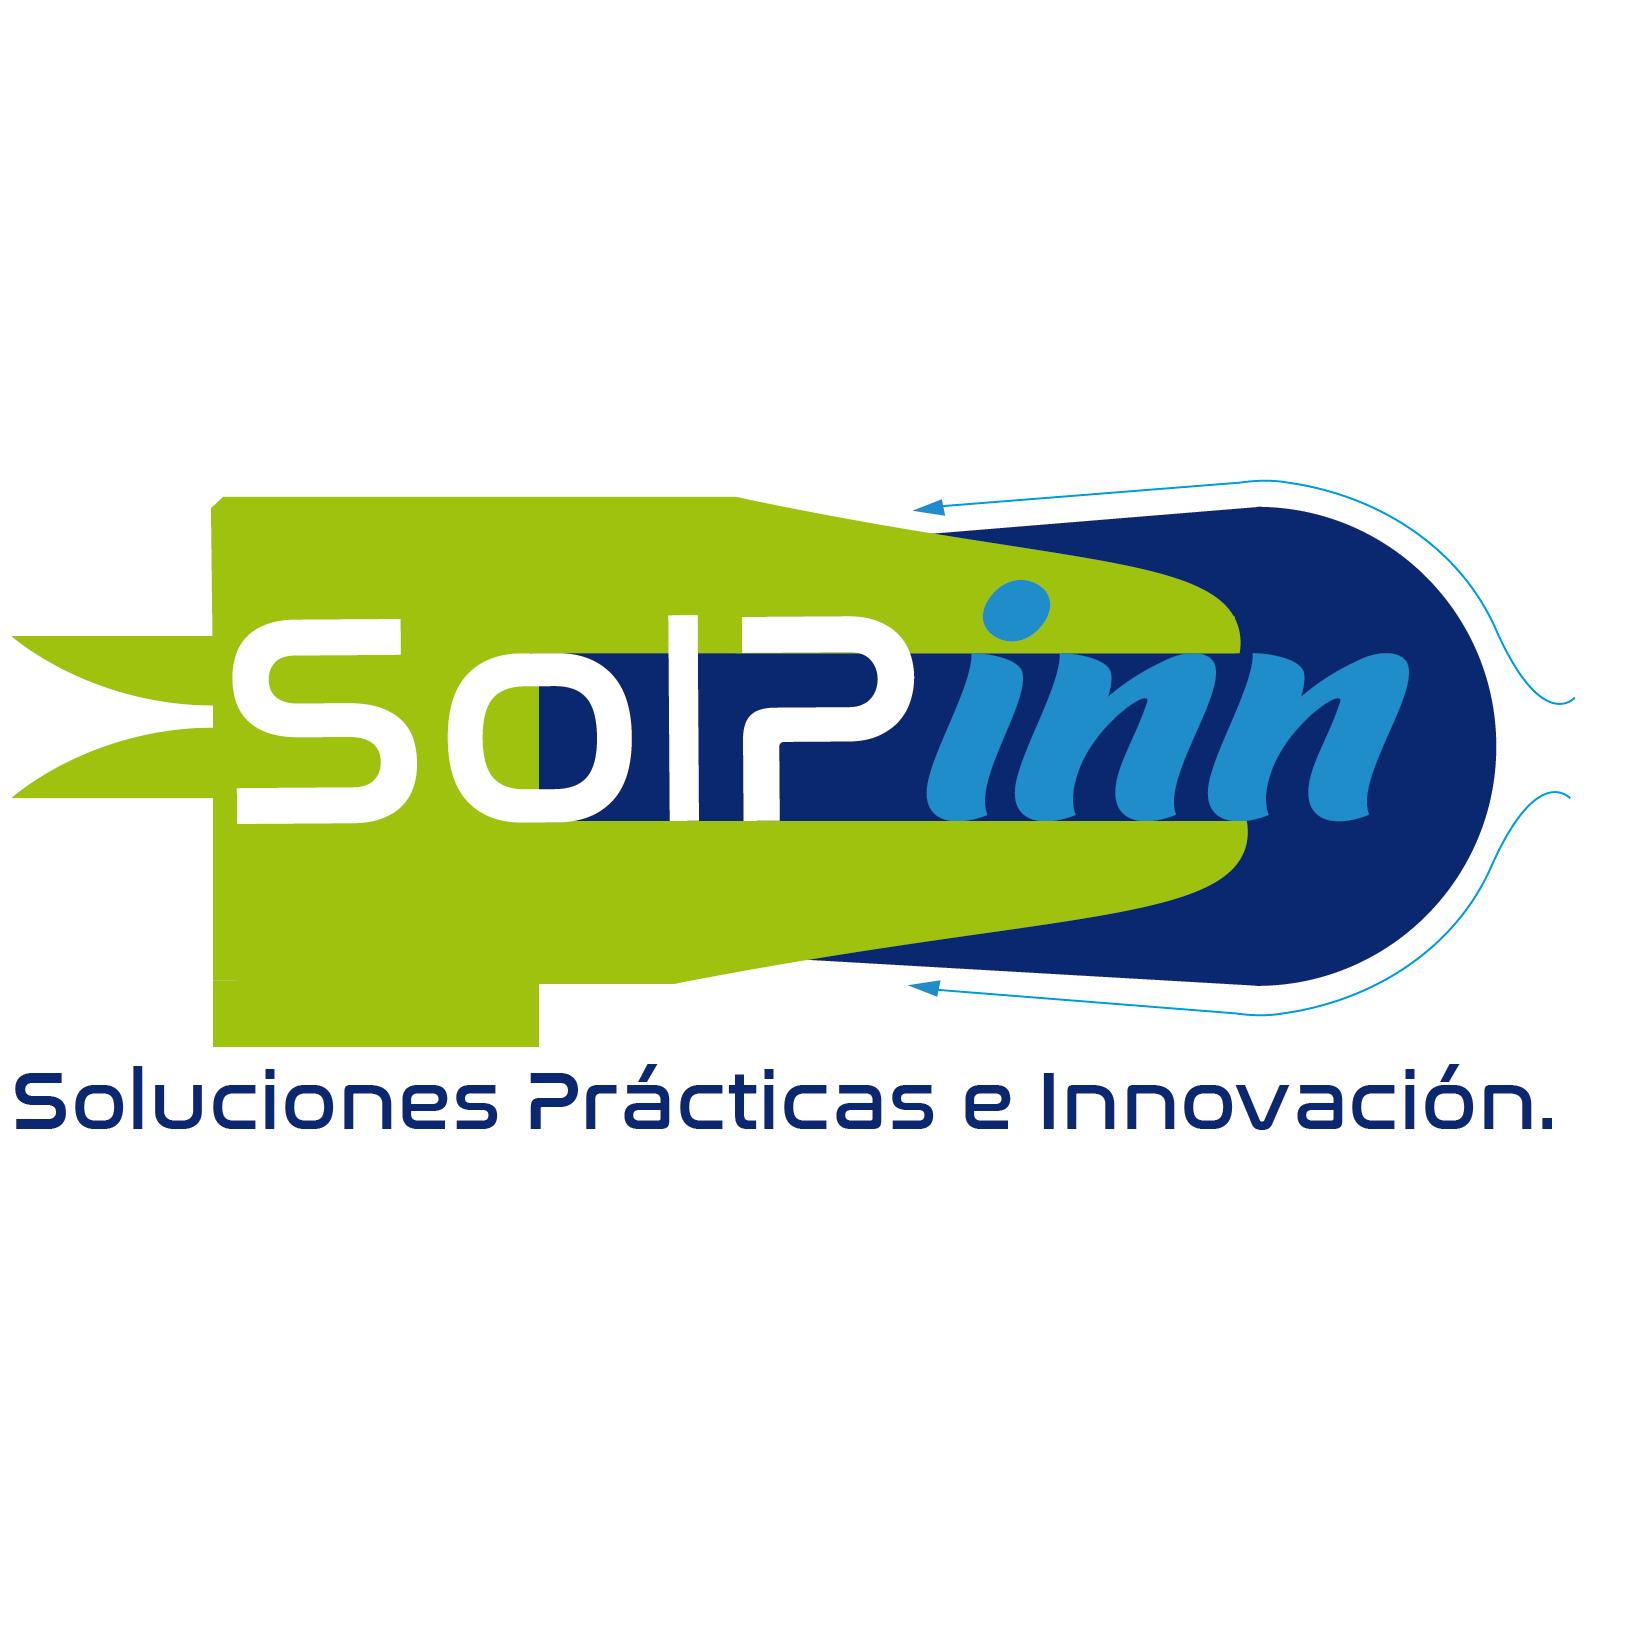 SolPinn